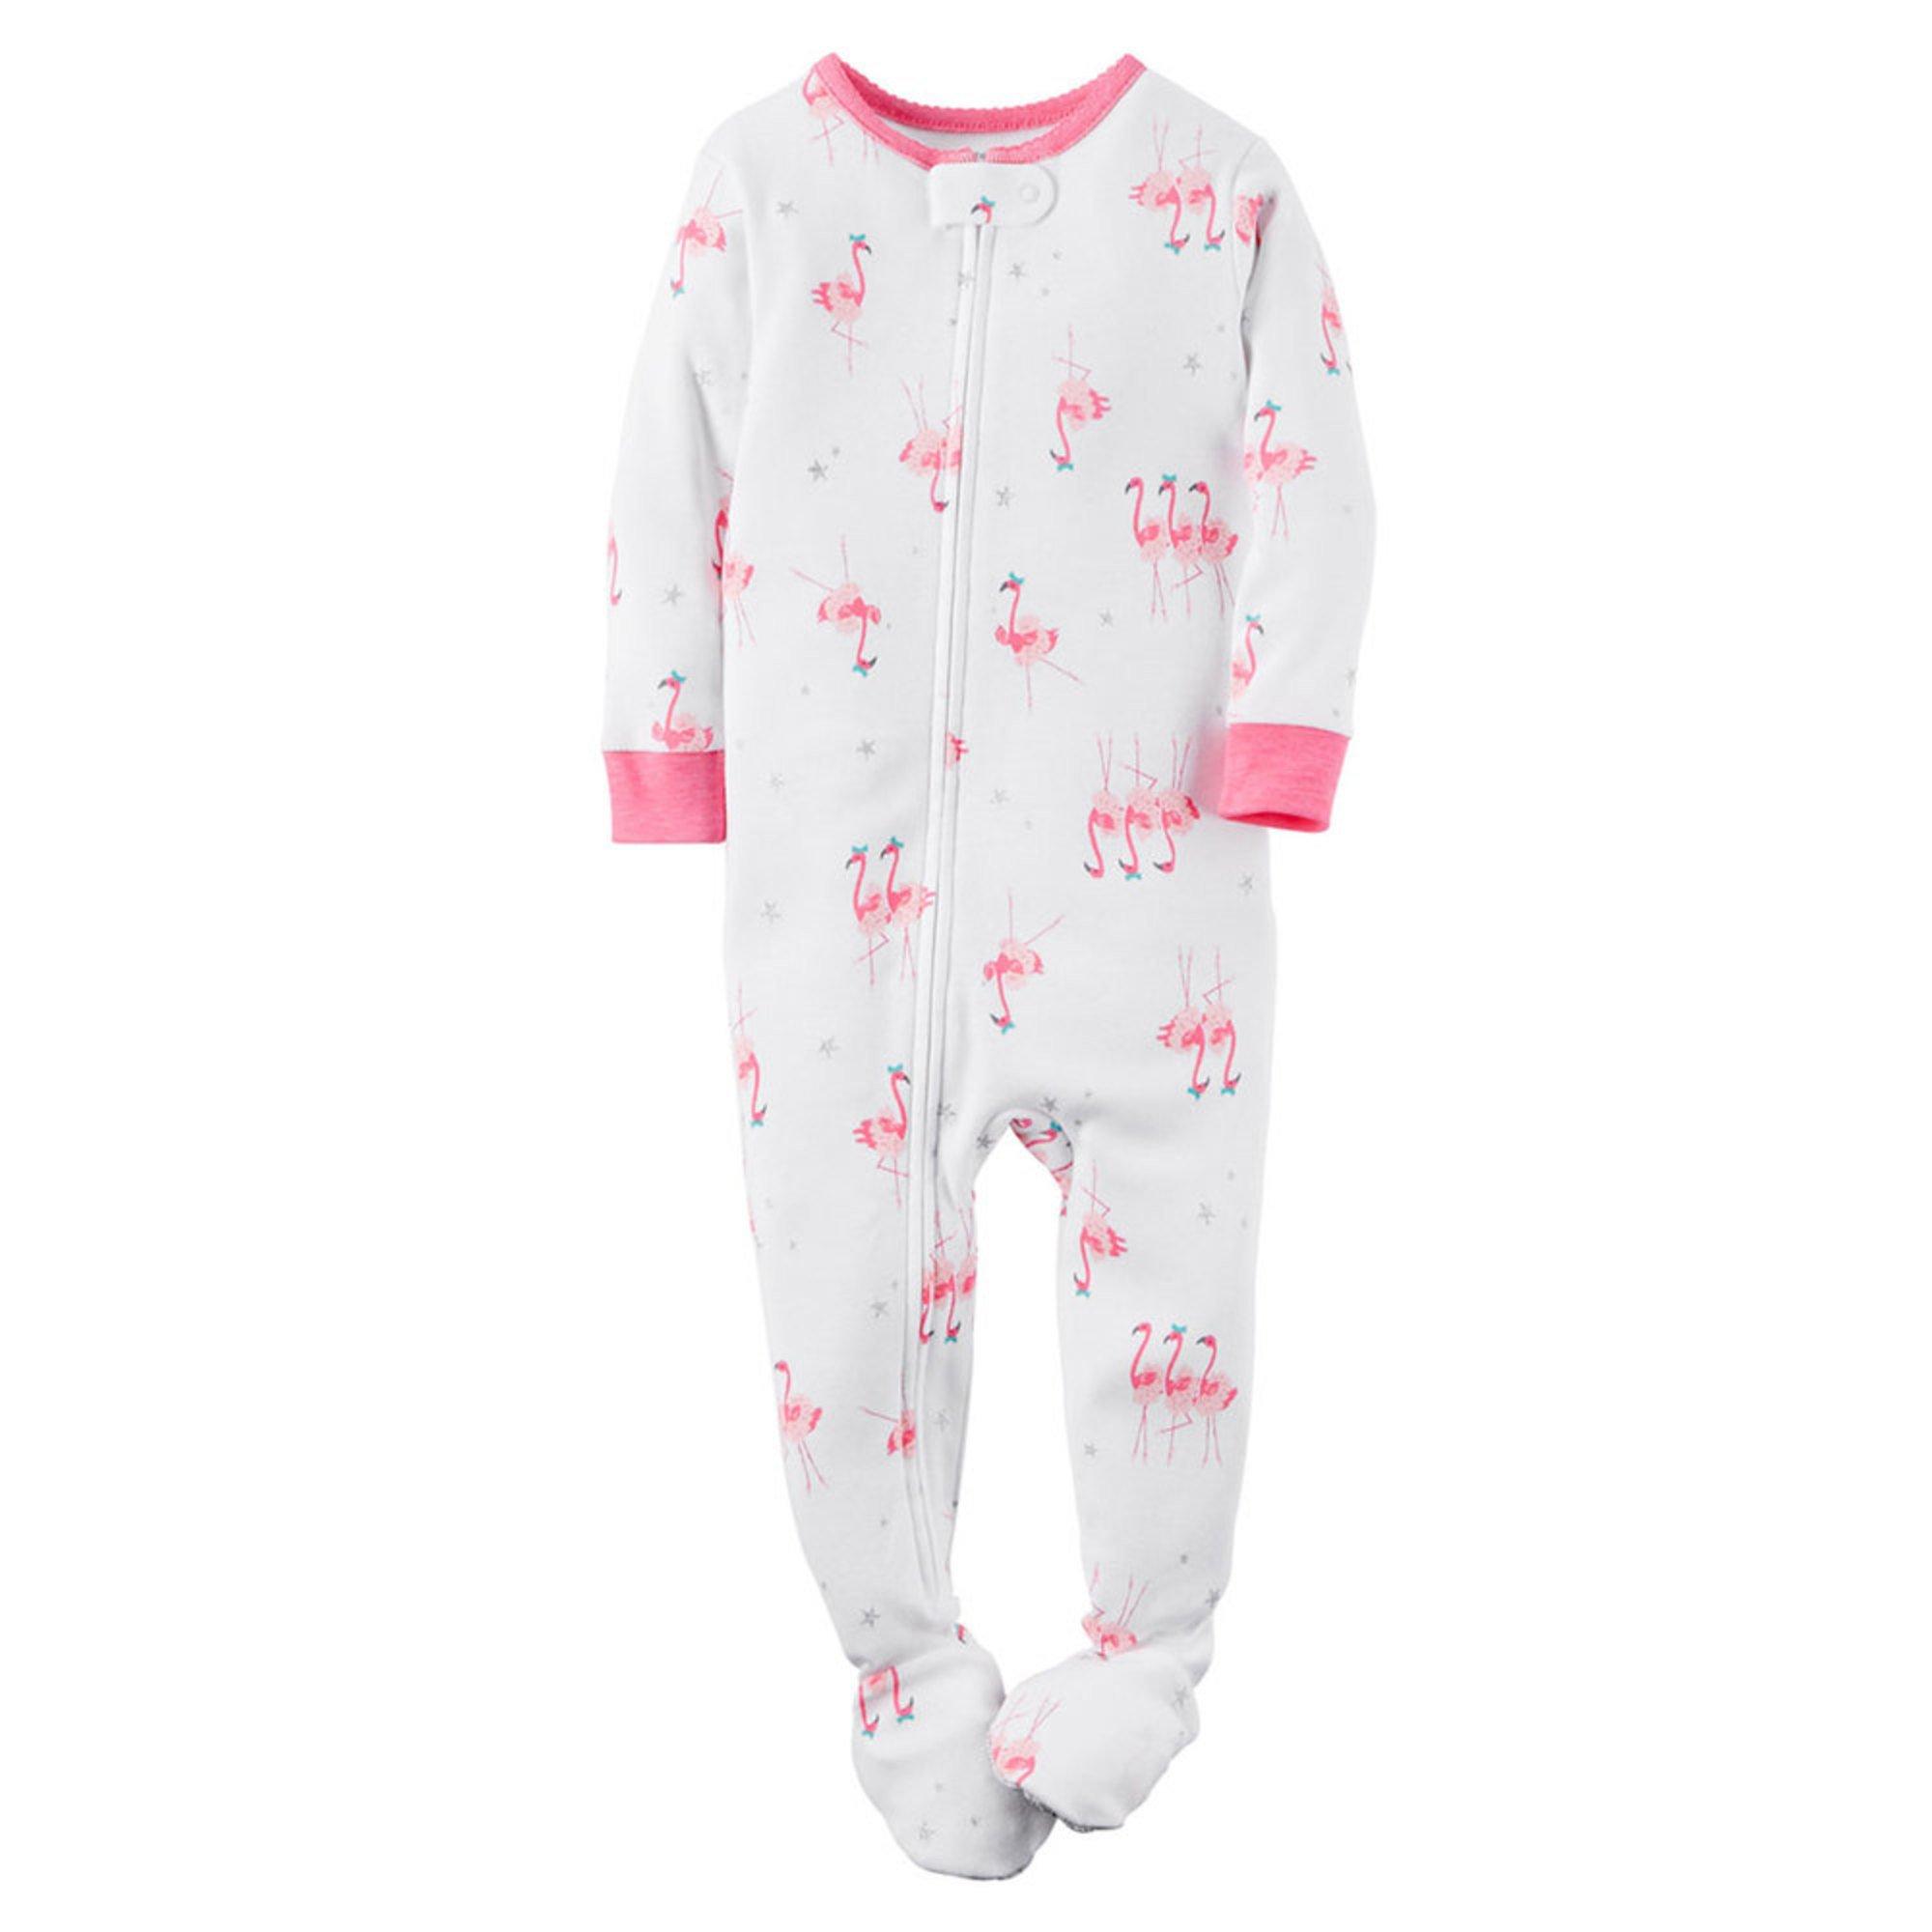 Shop for toddler boy pajamas at failvideo.ml Explore our selection of toddler boys Christmas pajamas, one piece pajamas, toddler boy pajamas sets & more.